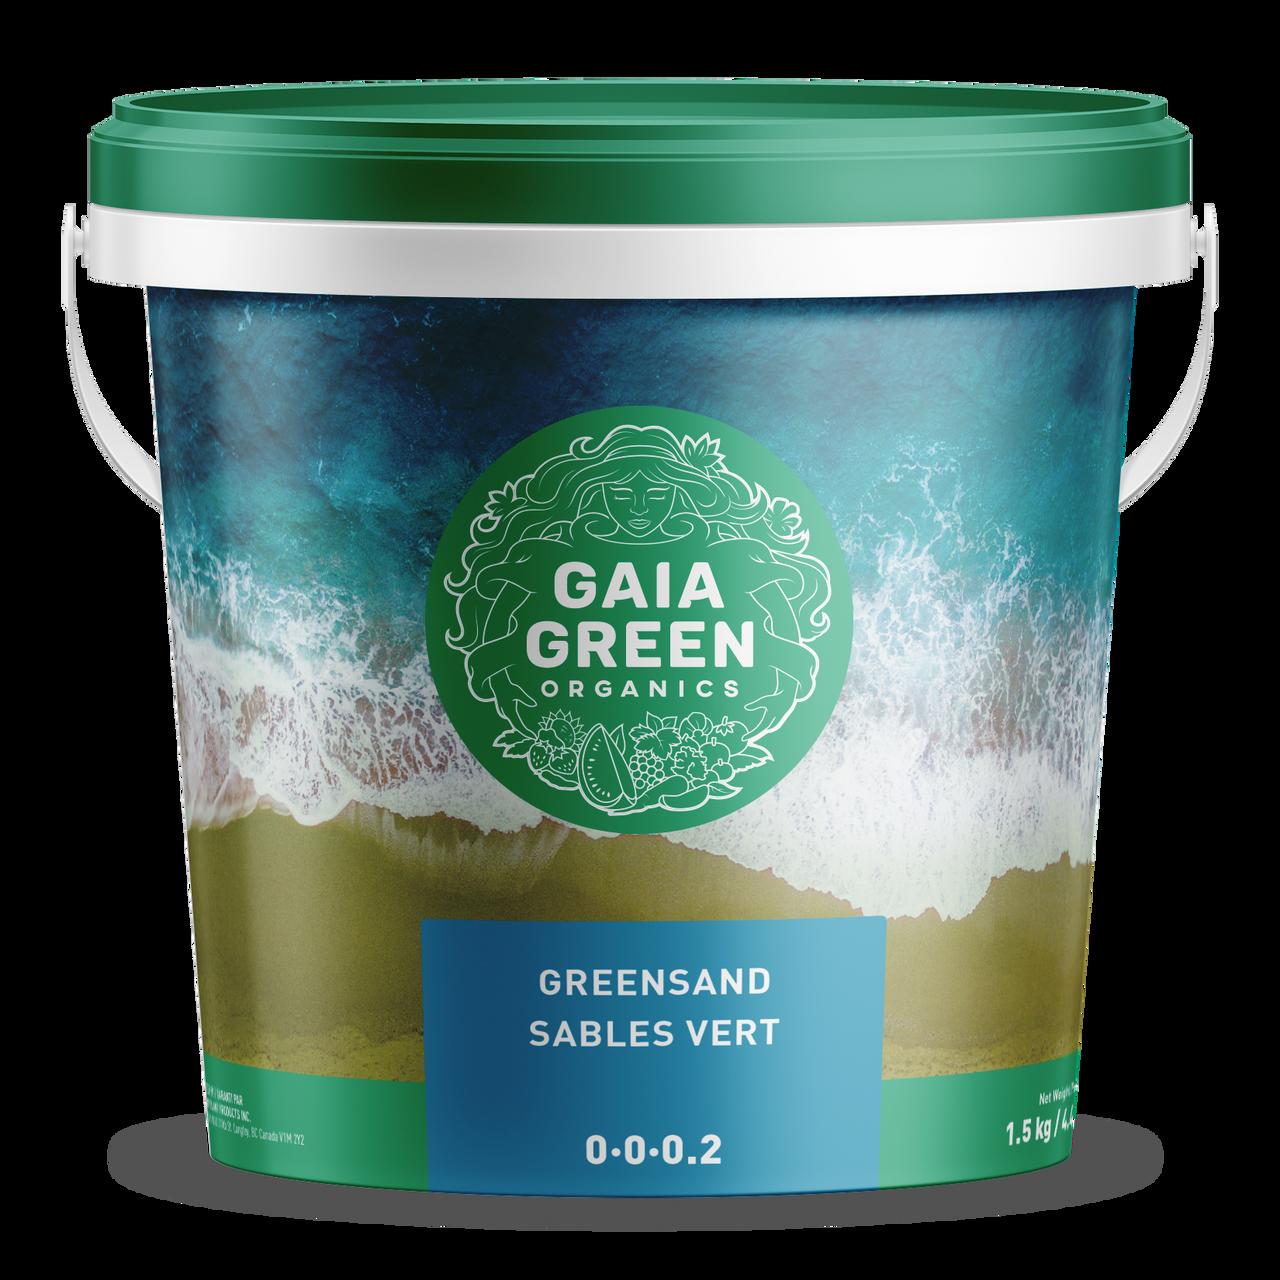 Gaia Green Greensand 1.5kg